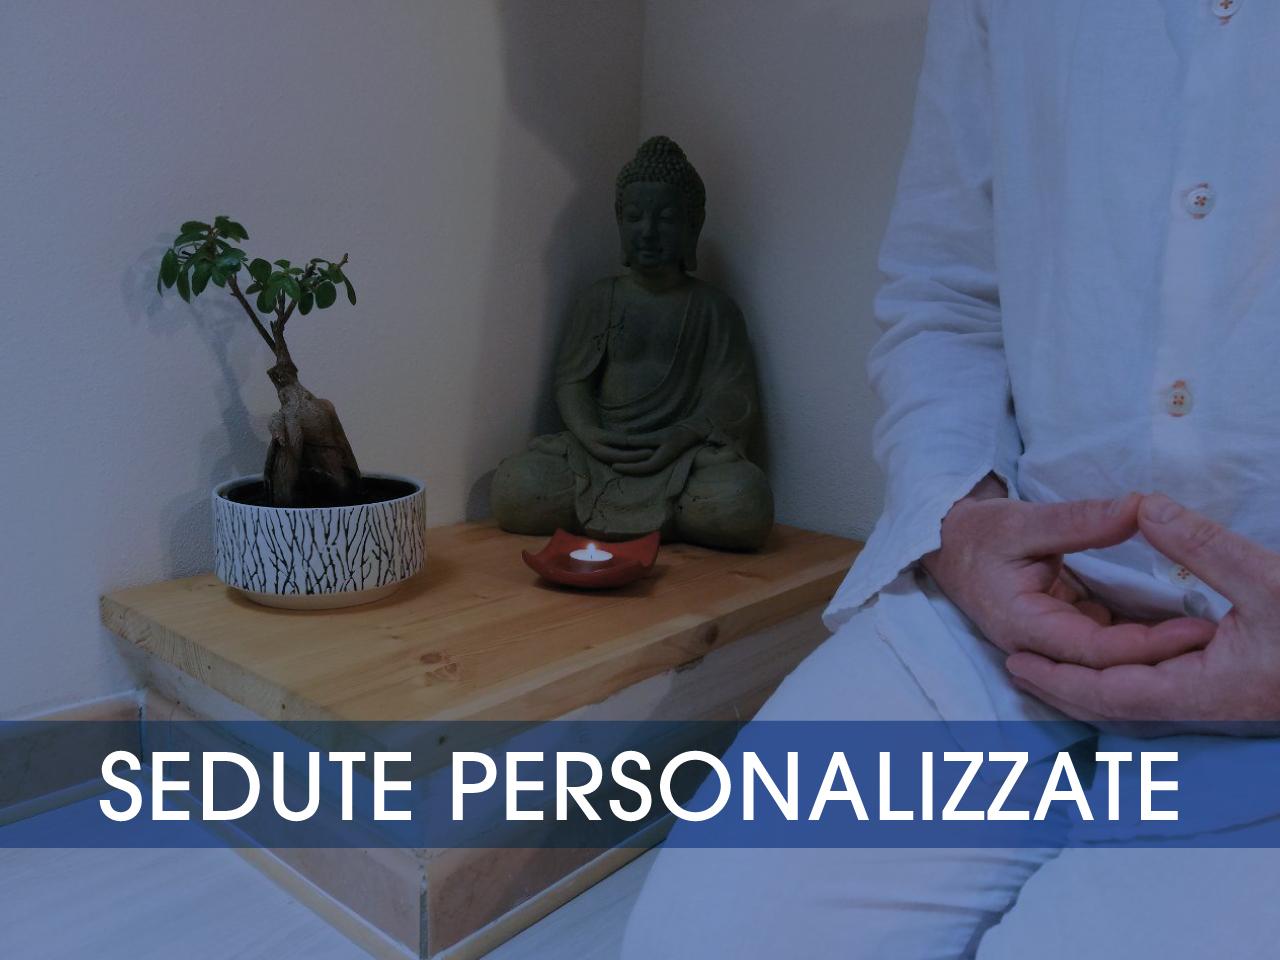 https://meditaedanza.com/wp-content/uploads/2020/12/sedute-personalizzate.jpg